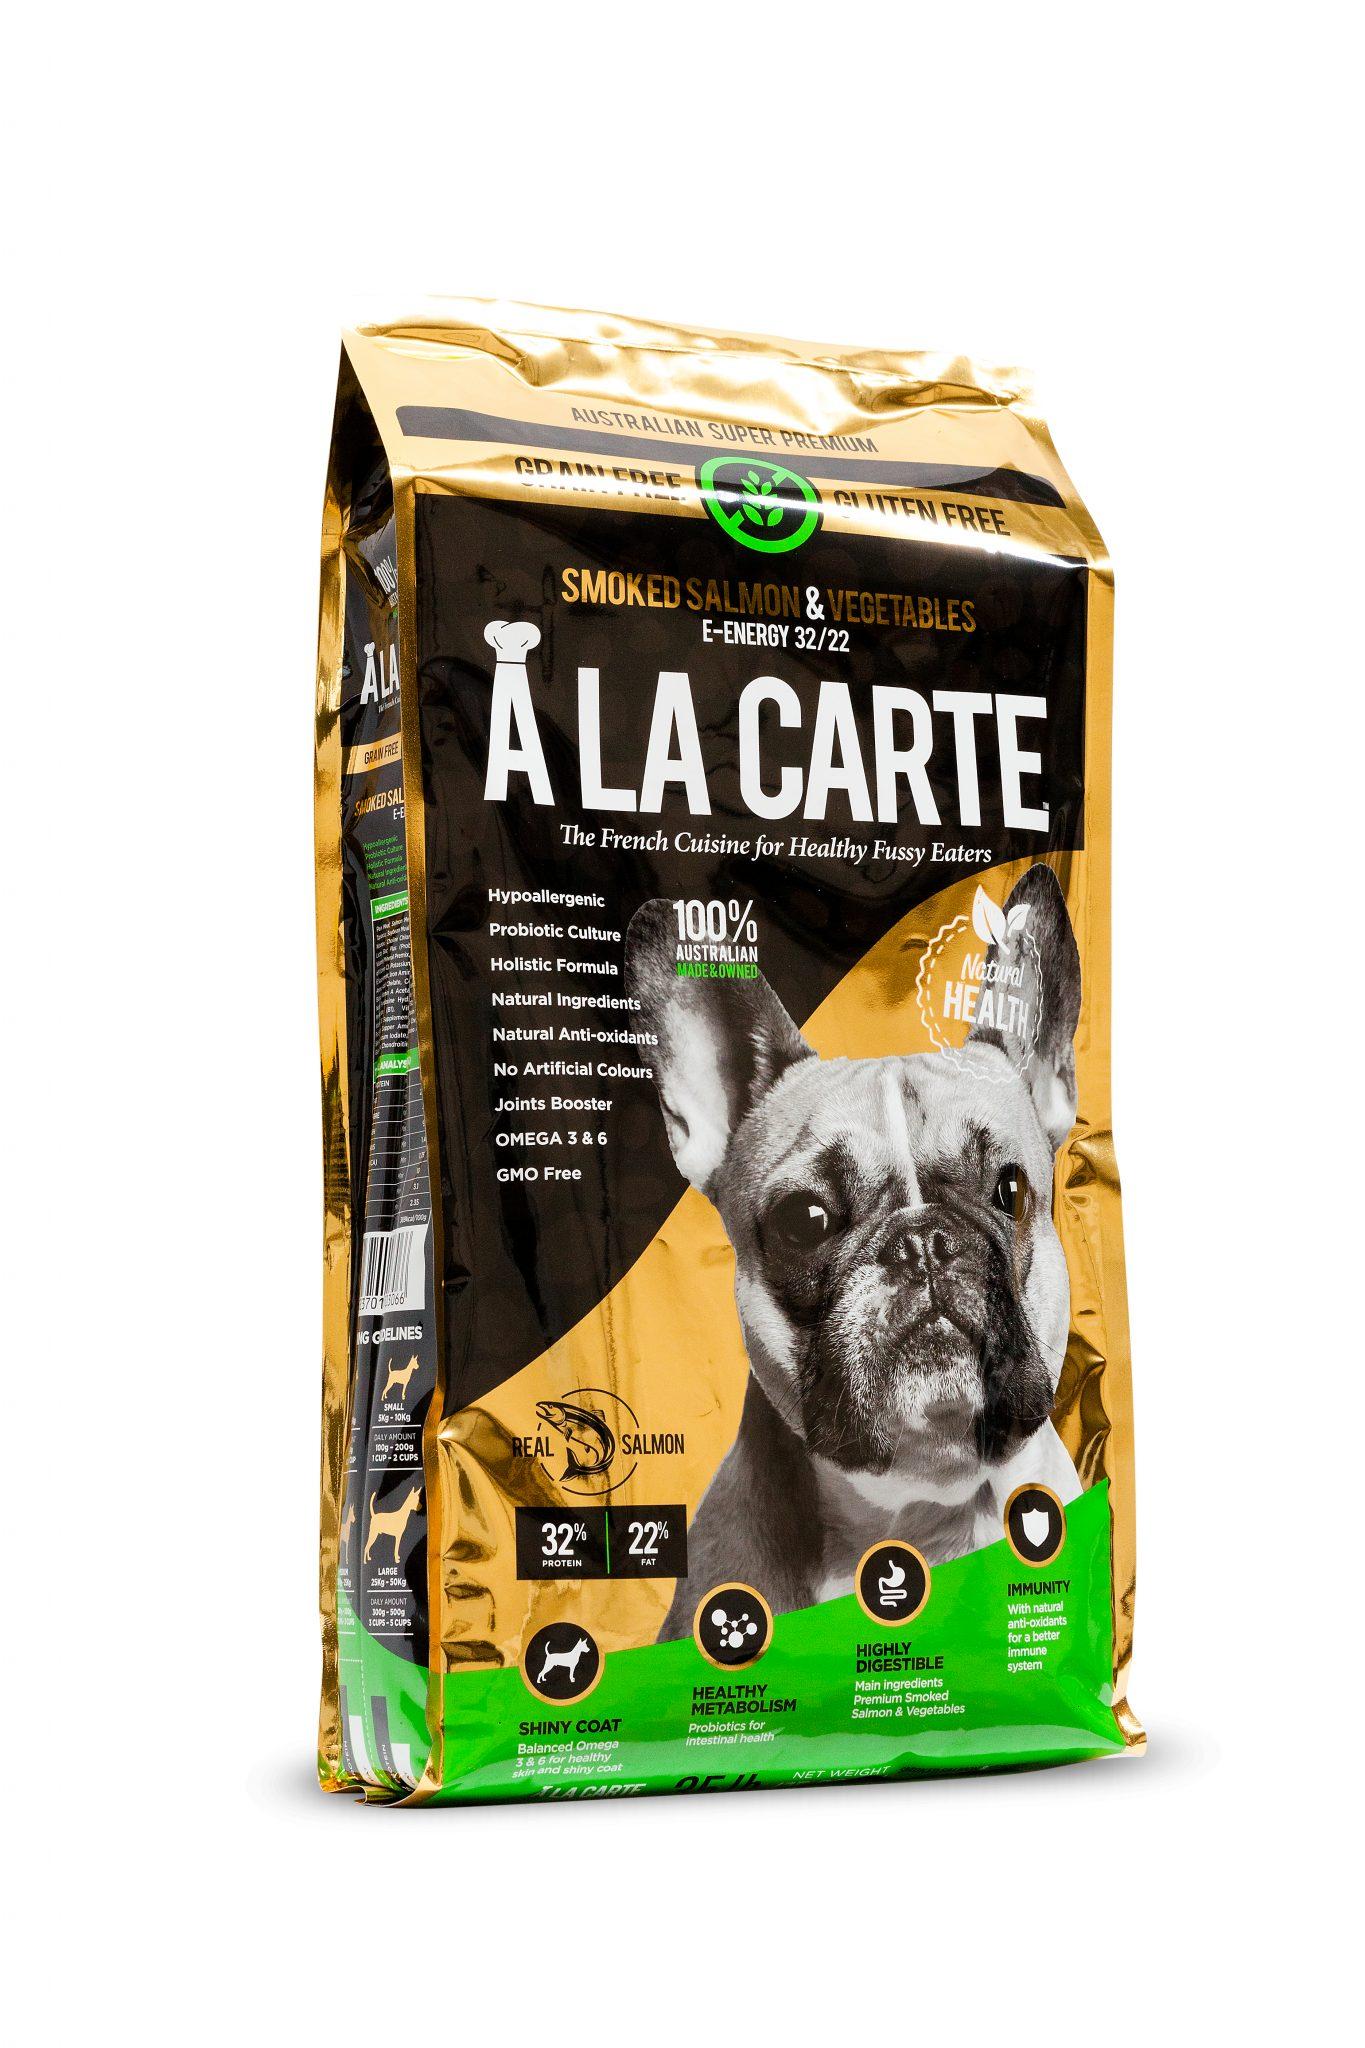 Is Purina A Good Dog Food Brand